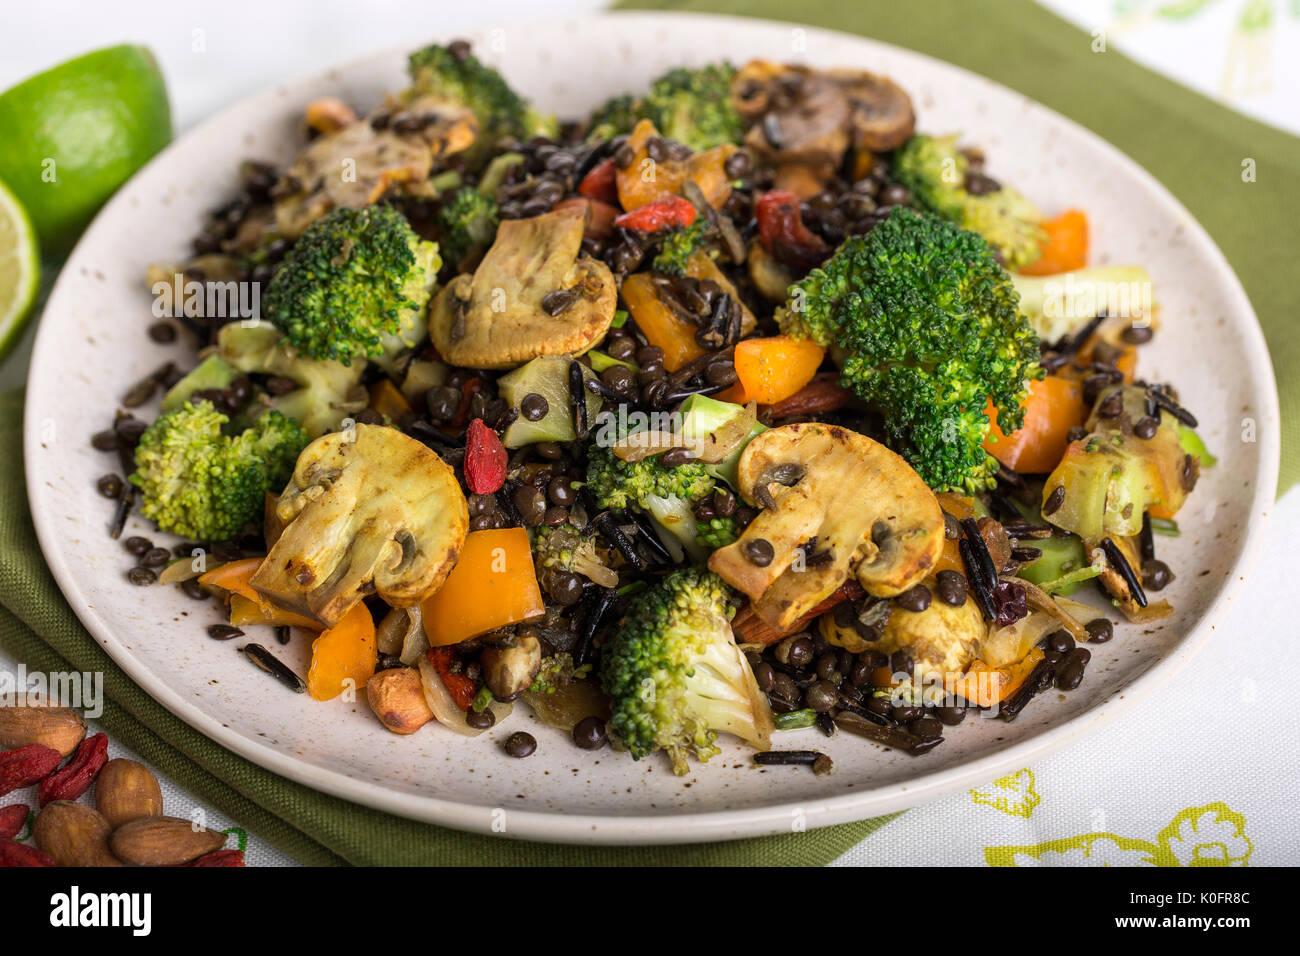 Closeup  shot of healthy Vegan Mix of Broccoli Wild Rice and Lentils dish - Stock Image